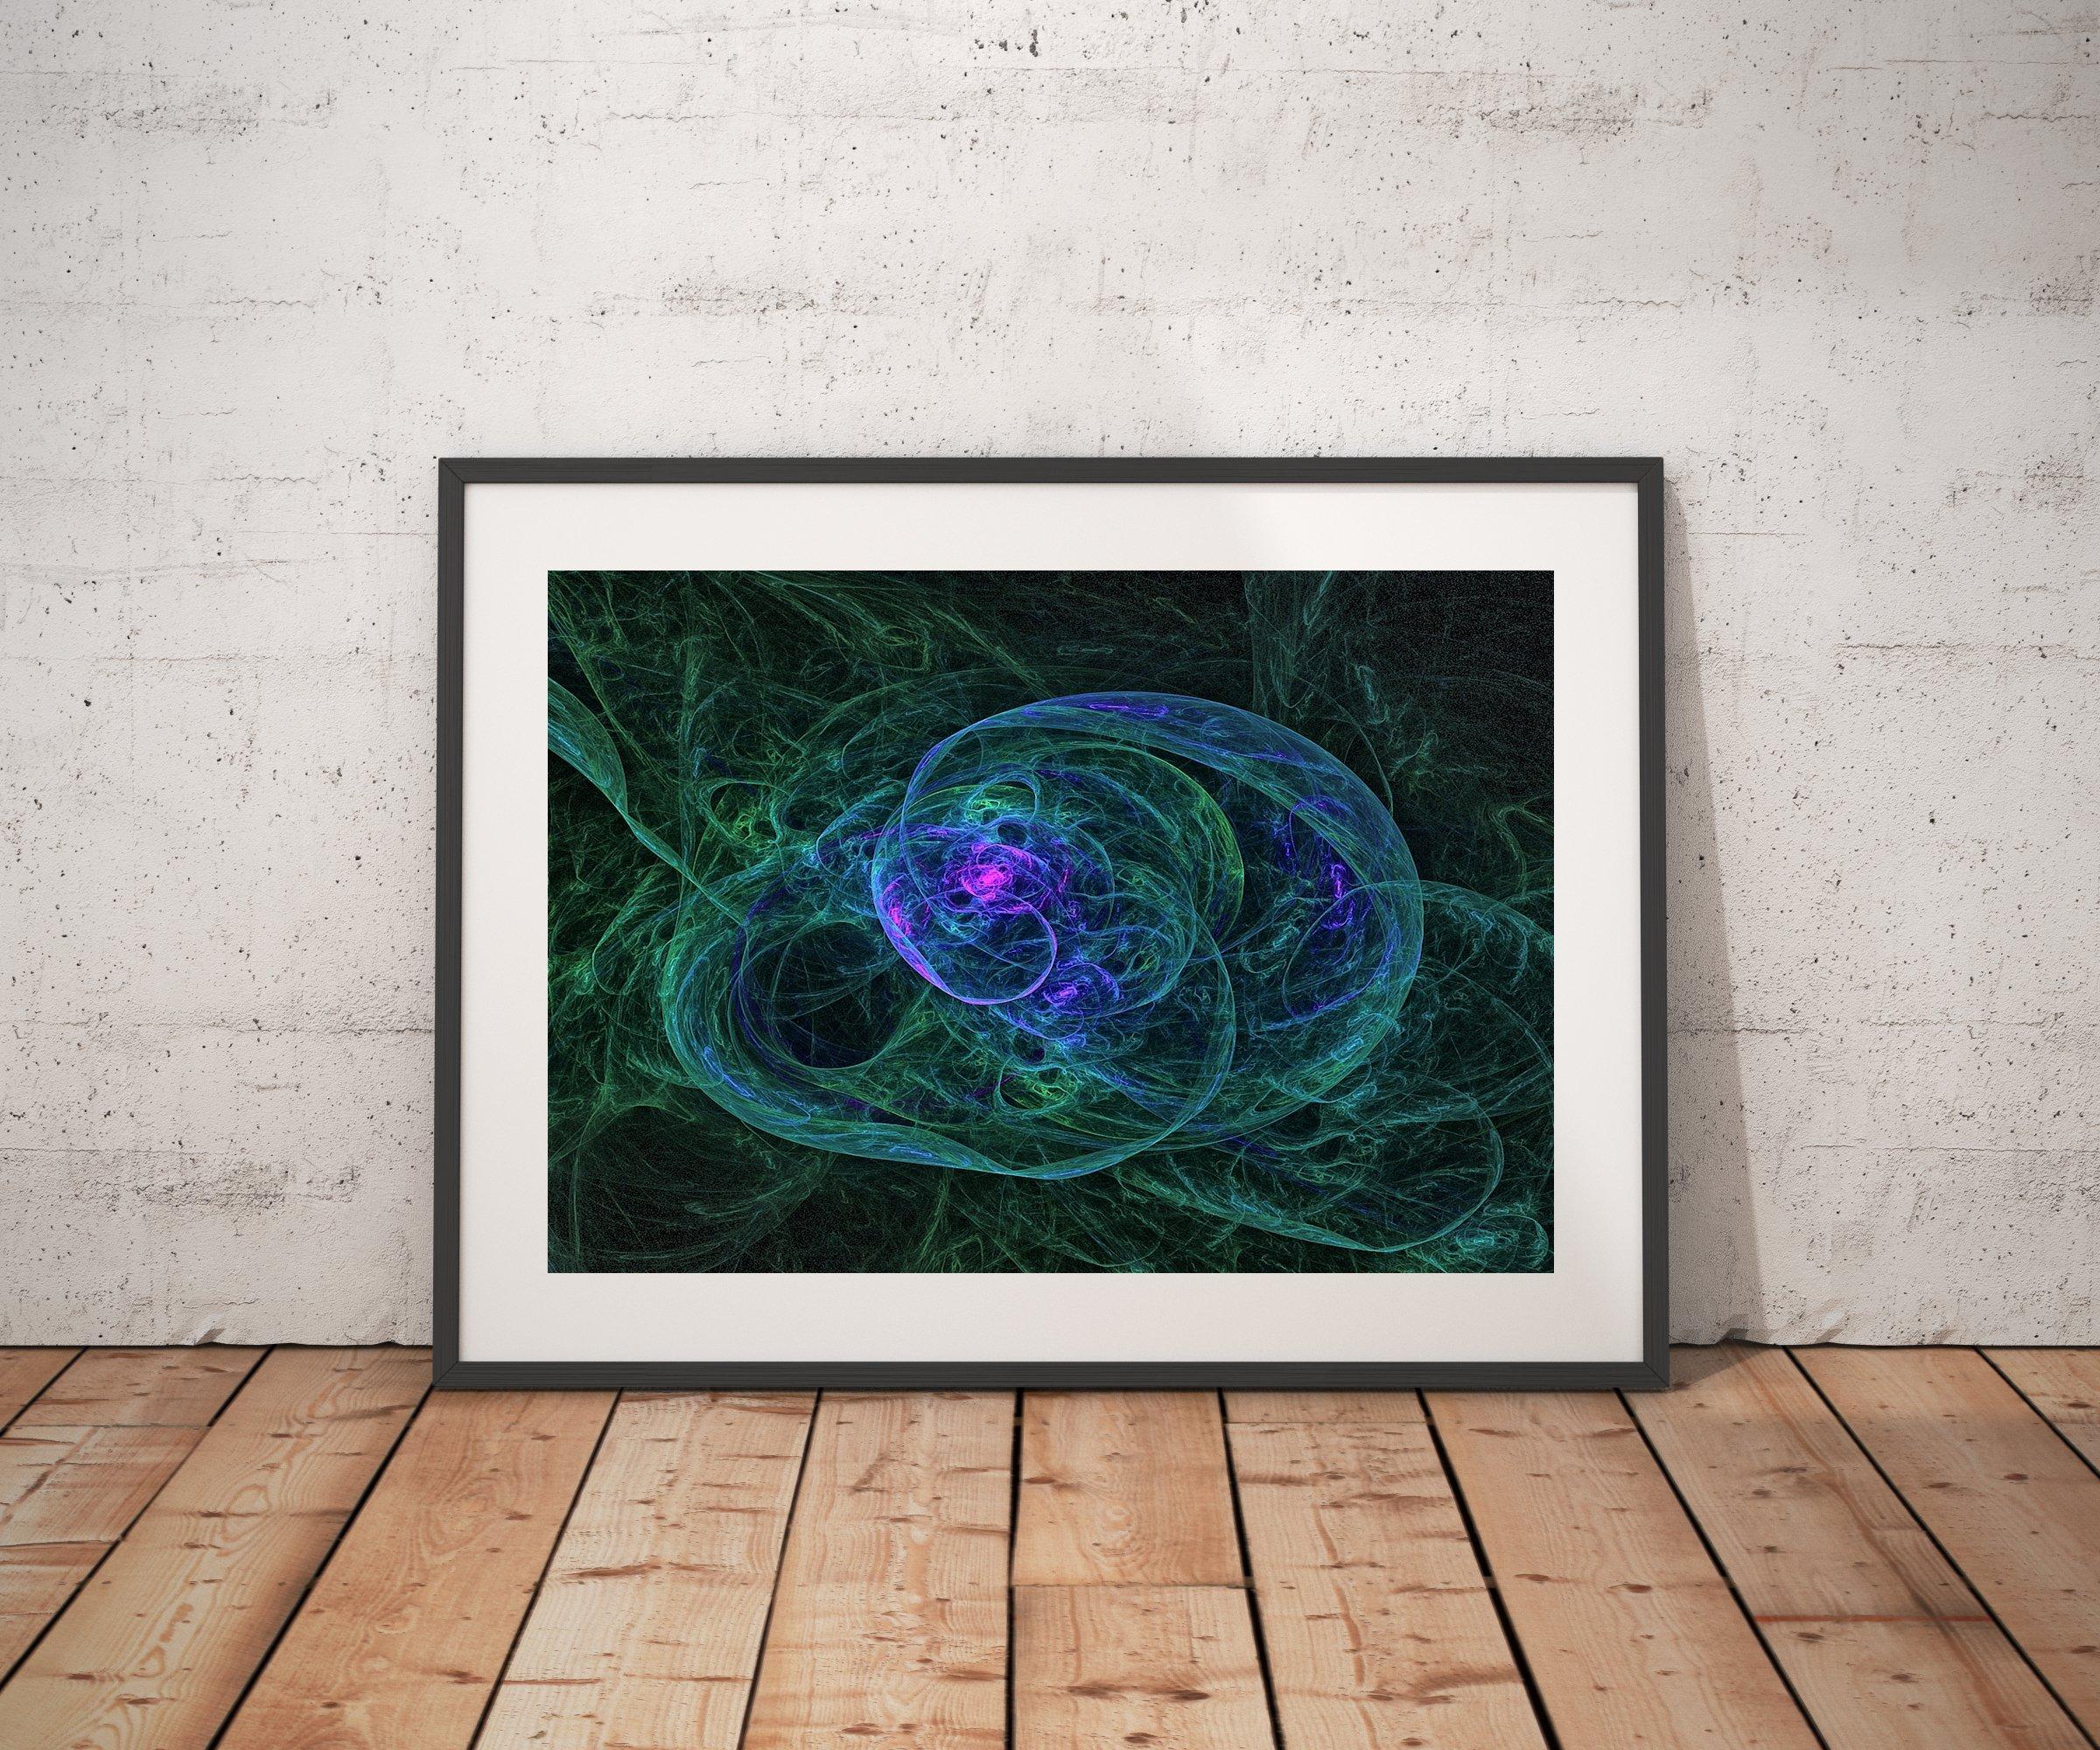 Untitled - Abstract Digital Art